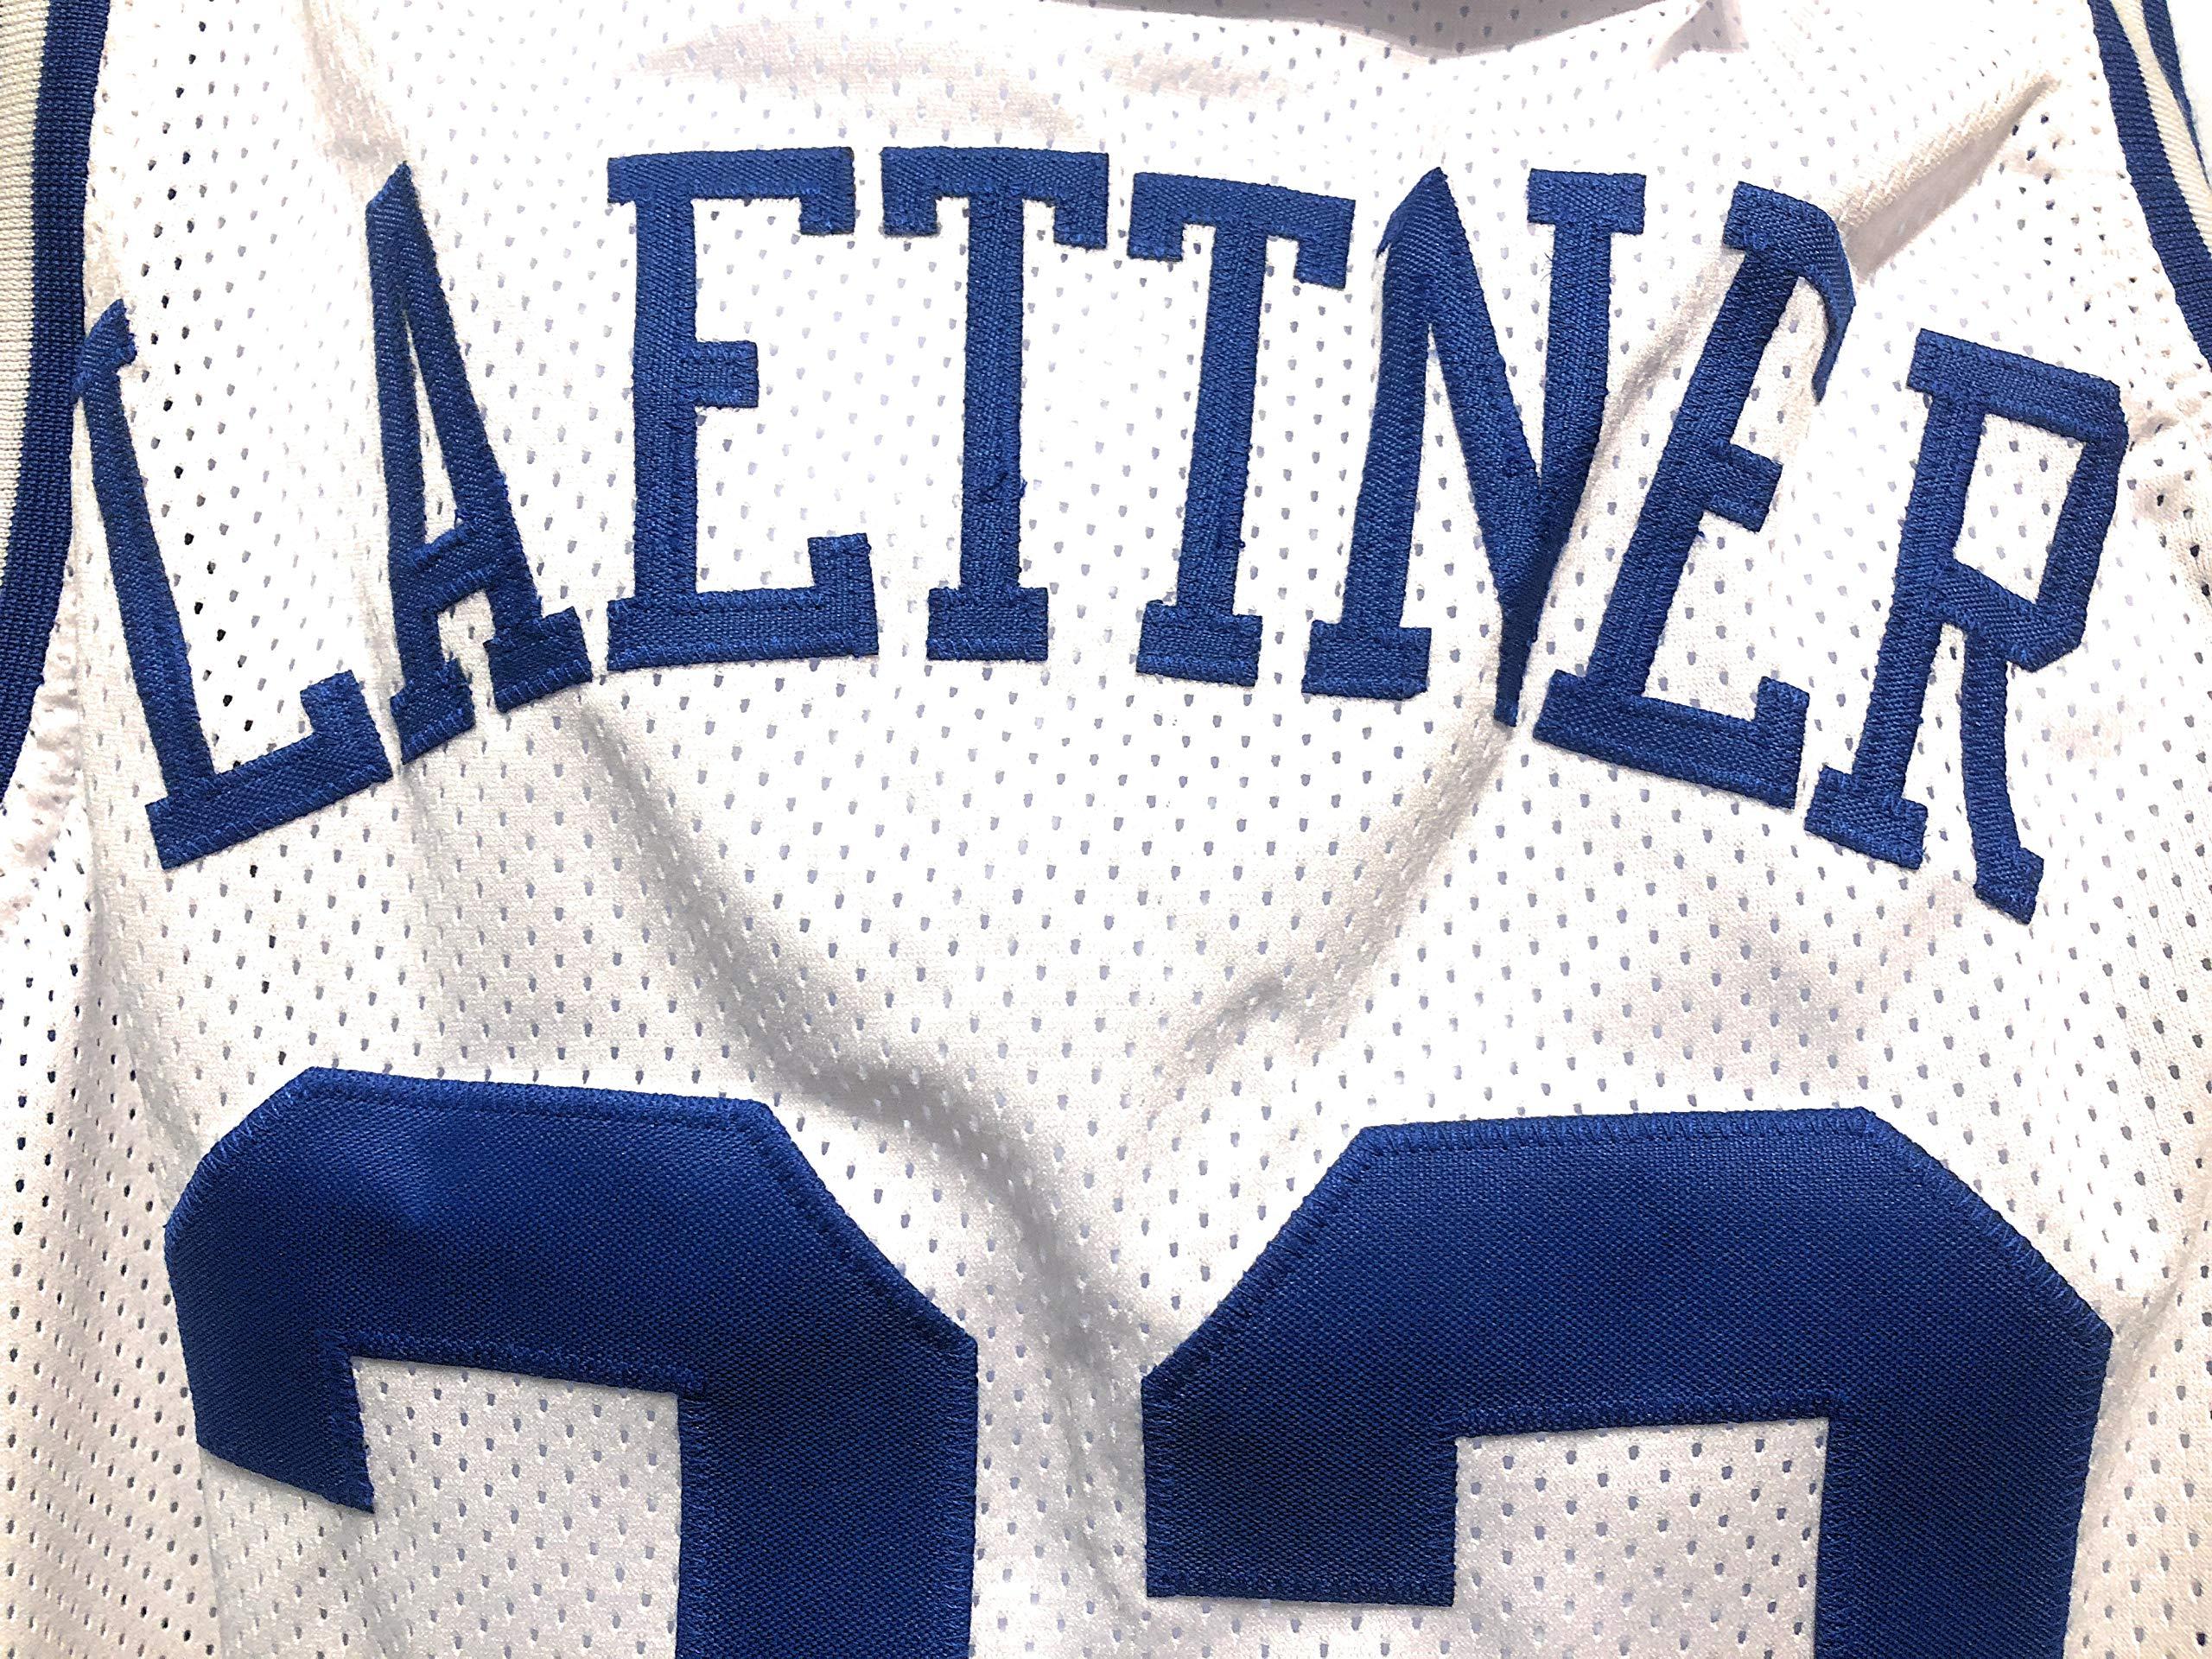 Christian Laettner Duke Blue Devils Signed Autograph Custom Jersey JSA Witnessed Certified